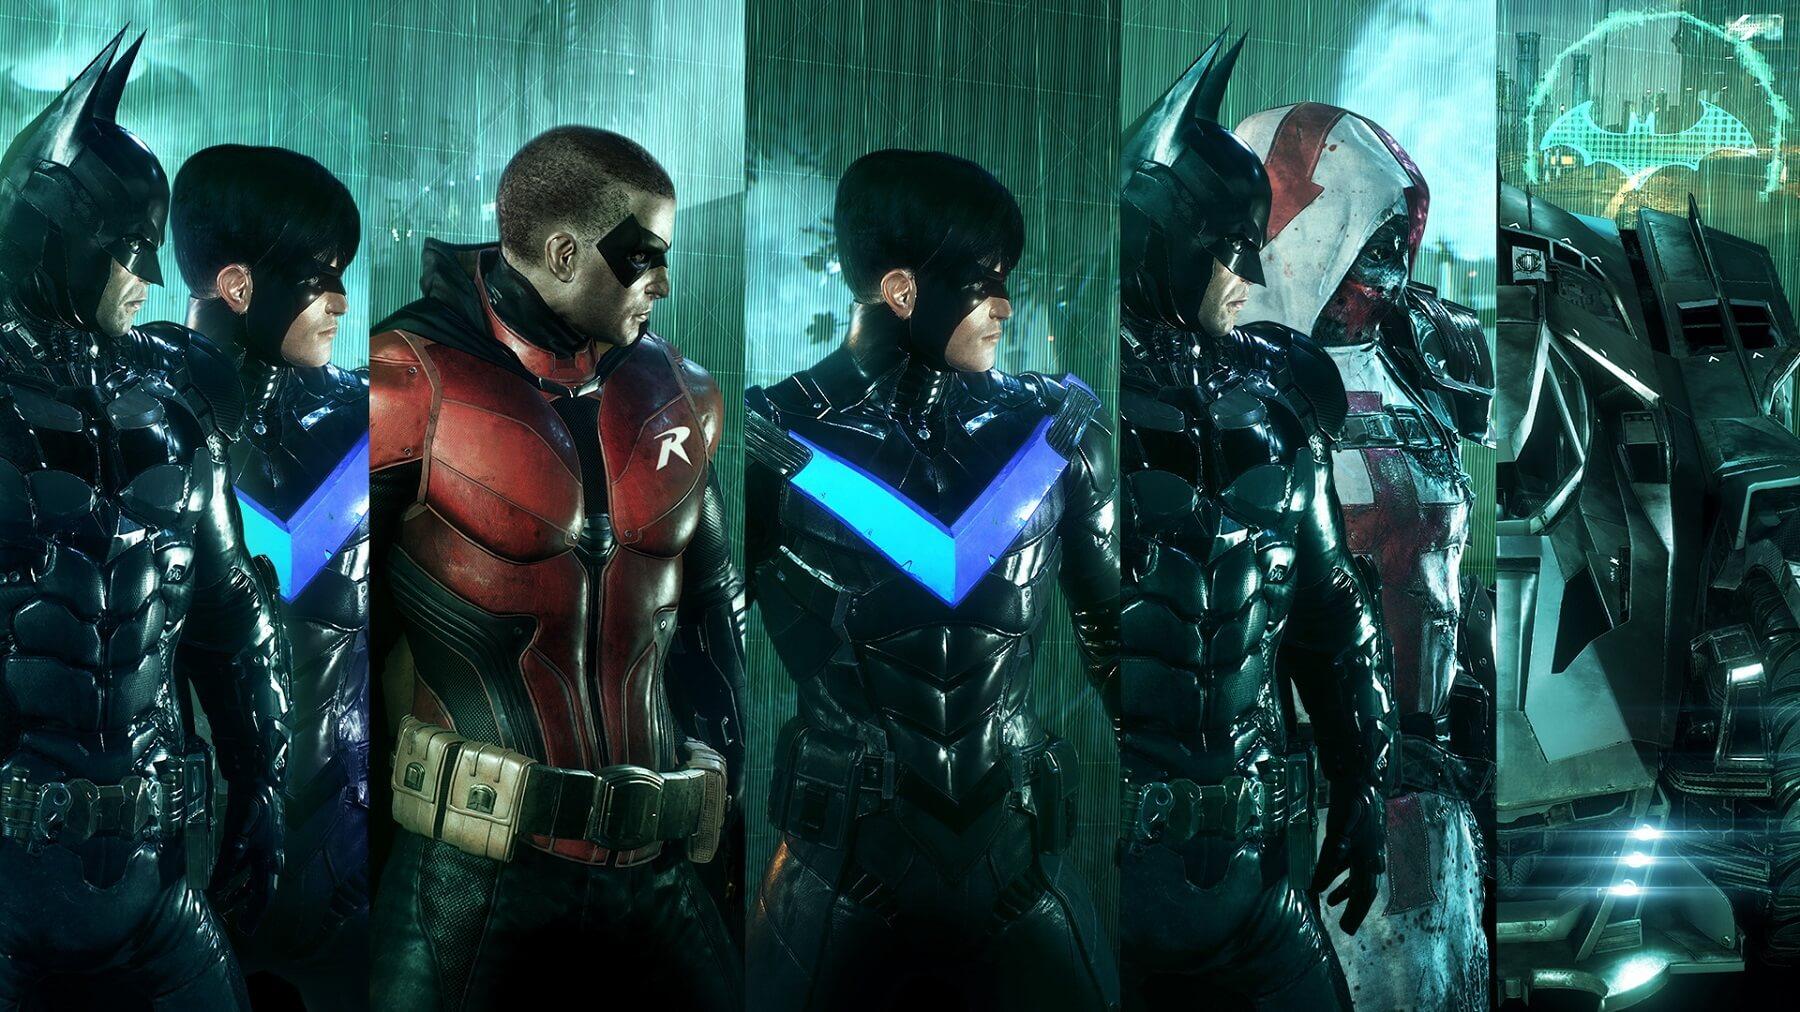 Next Month's Batman: Arkham Knight DLC Revealed